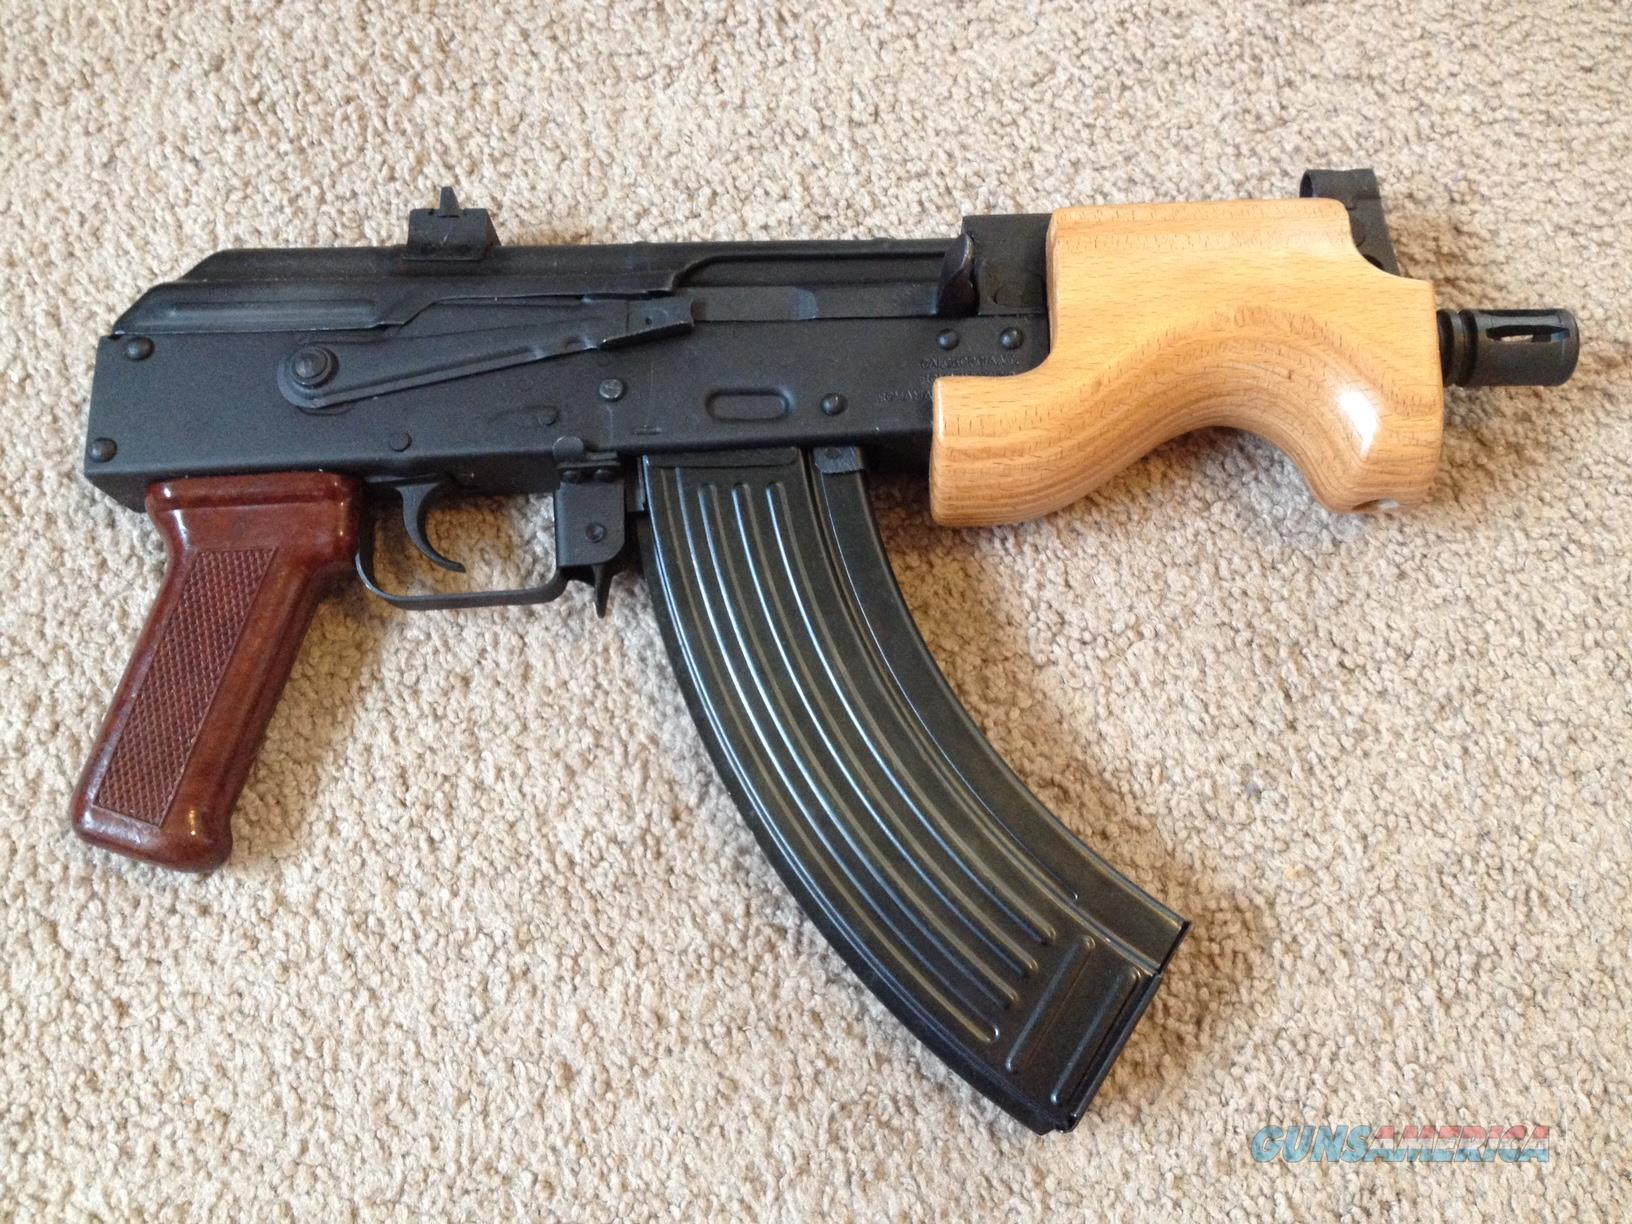 micro mini ak 47 pistol smallest ak pistol made for sale. Black Bedroom Furniture Sets. Home Design Ideas